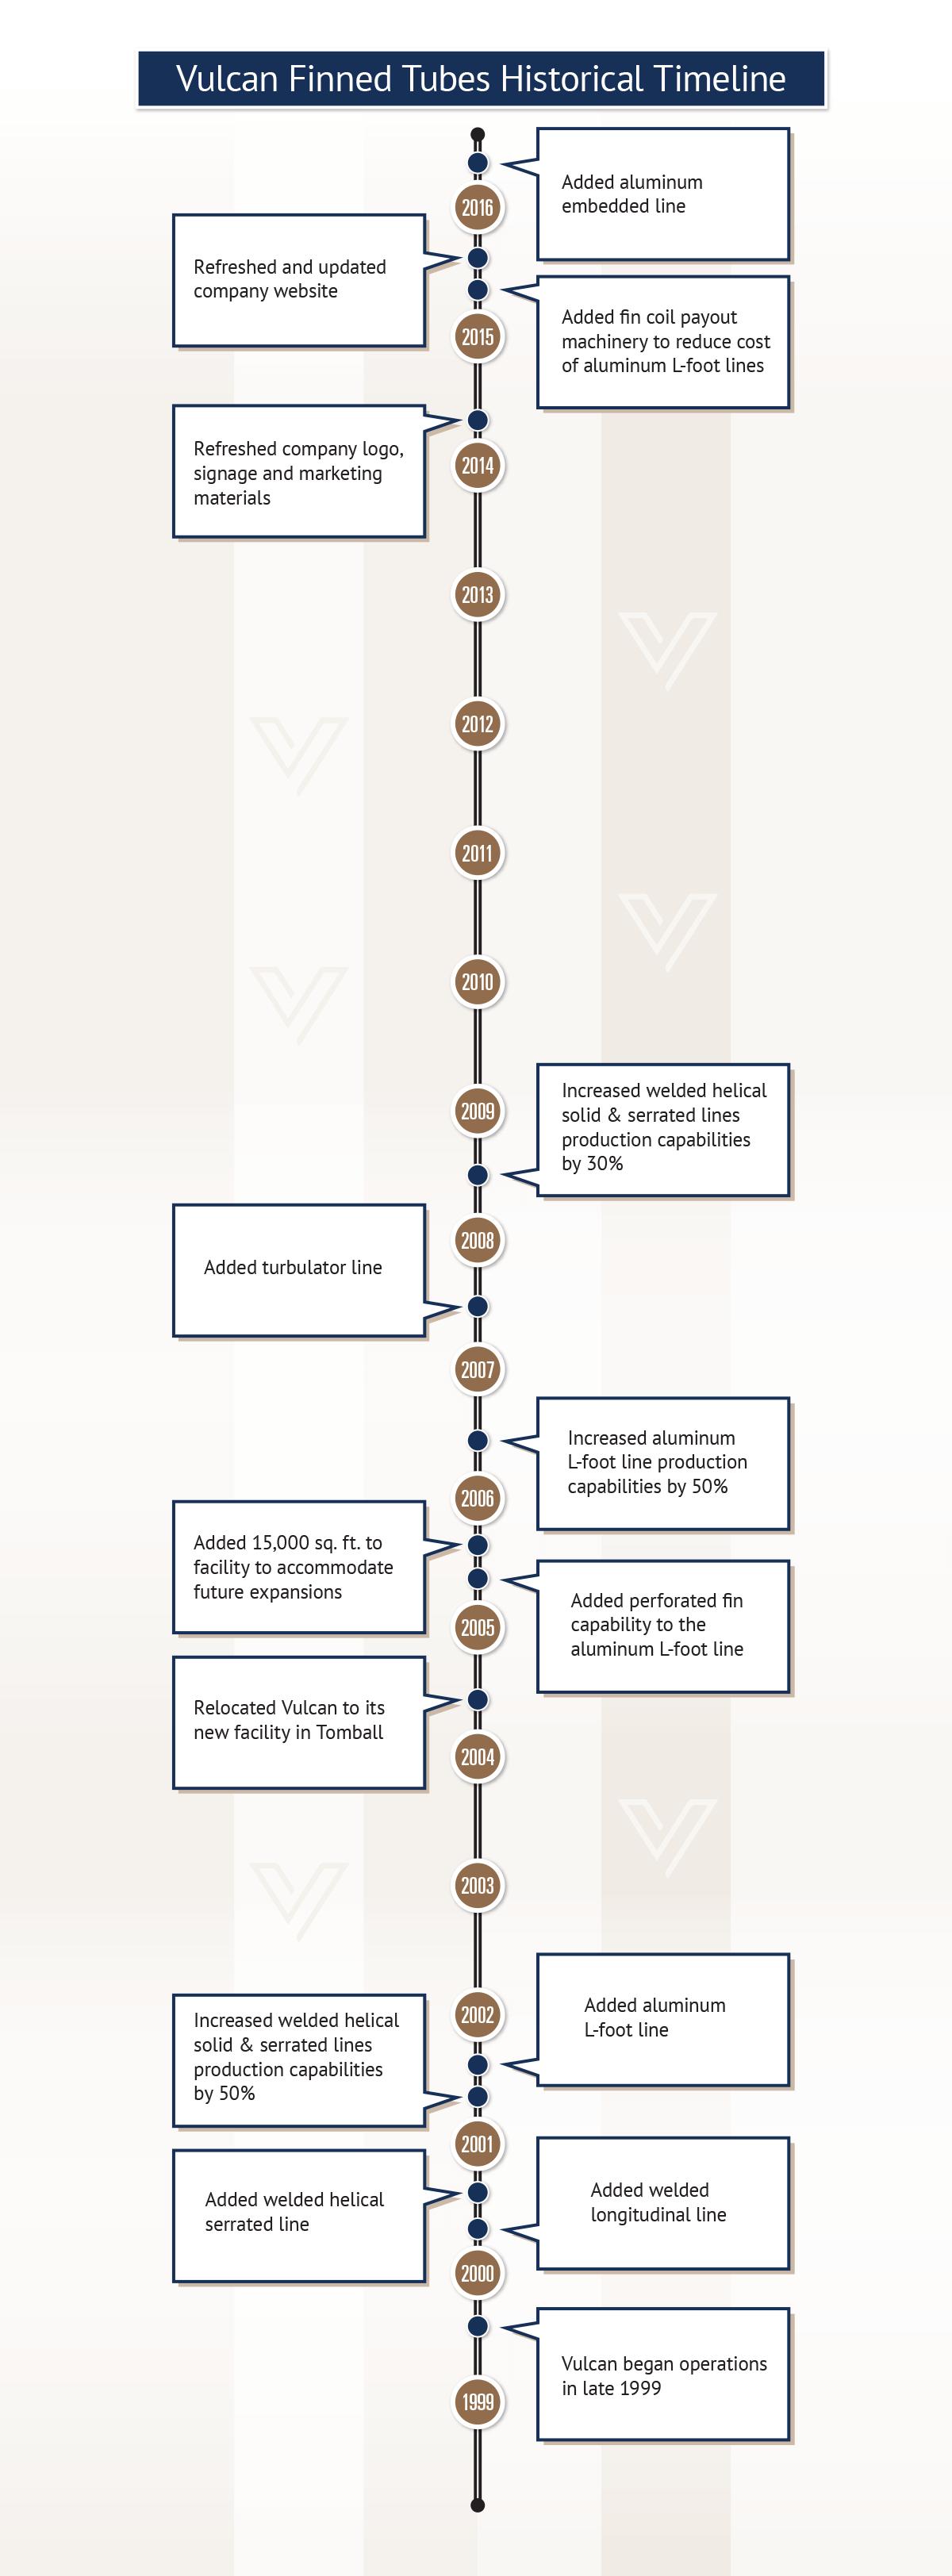 Vulcan Timeline